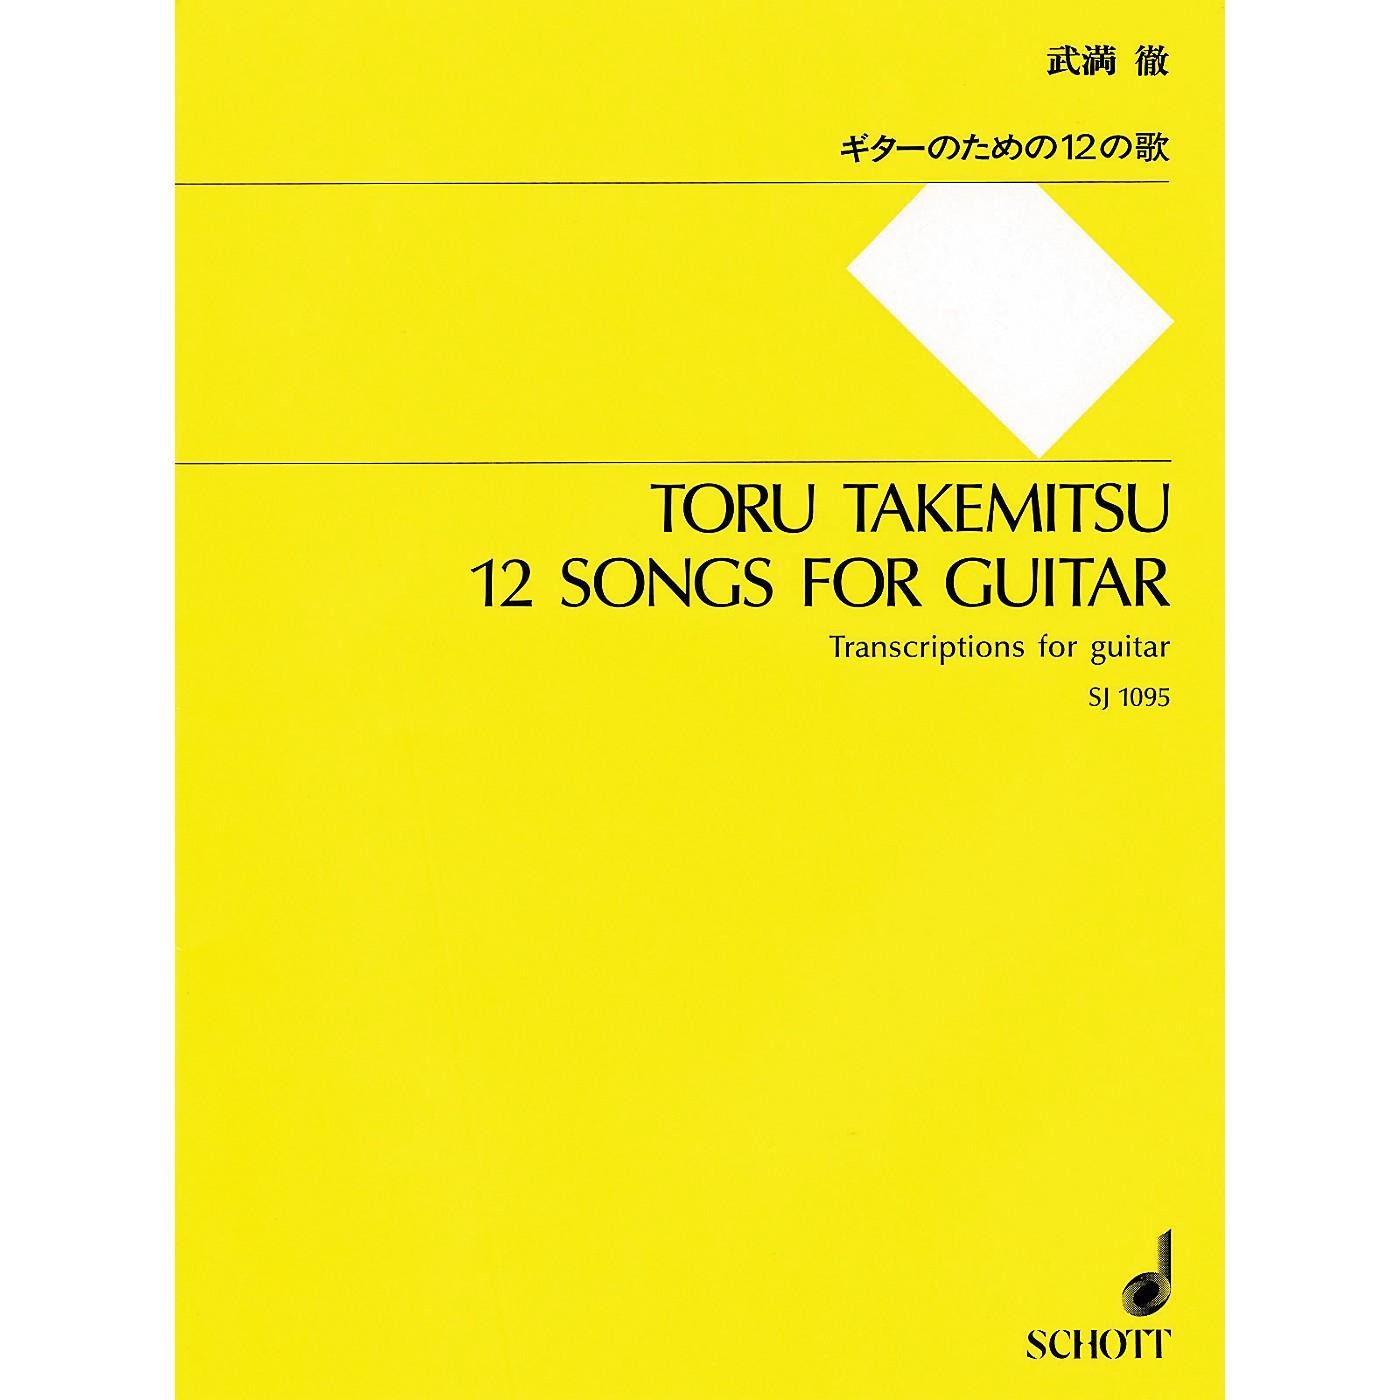 Schott Toru Takemitsu 12 Songs for Classical Guitar Standard Notation thumbnail